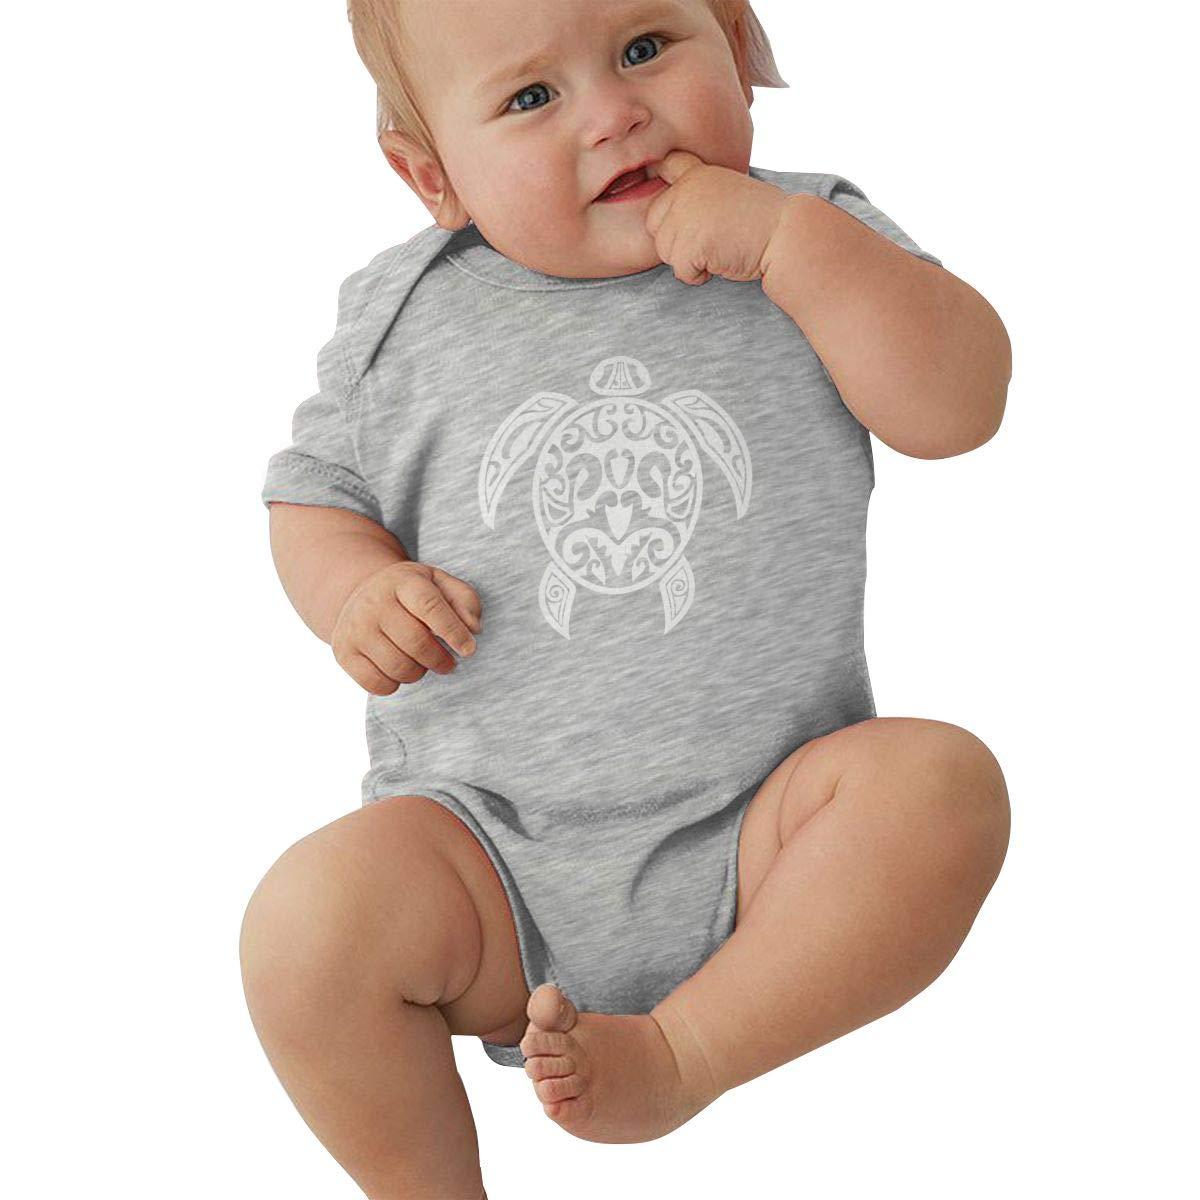 Newborn Baby Girl Boy Tribal Sea Turtle Silhouette BodysuitBodysuit Jumpsuit Short Sleeve Bodysuit Tops Clothes